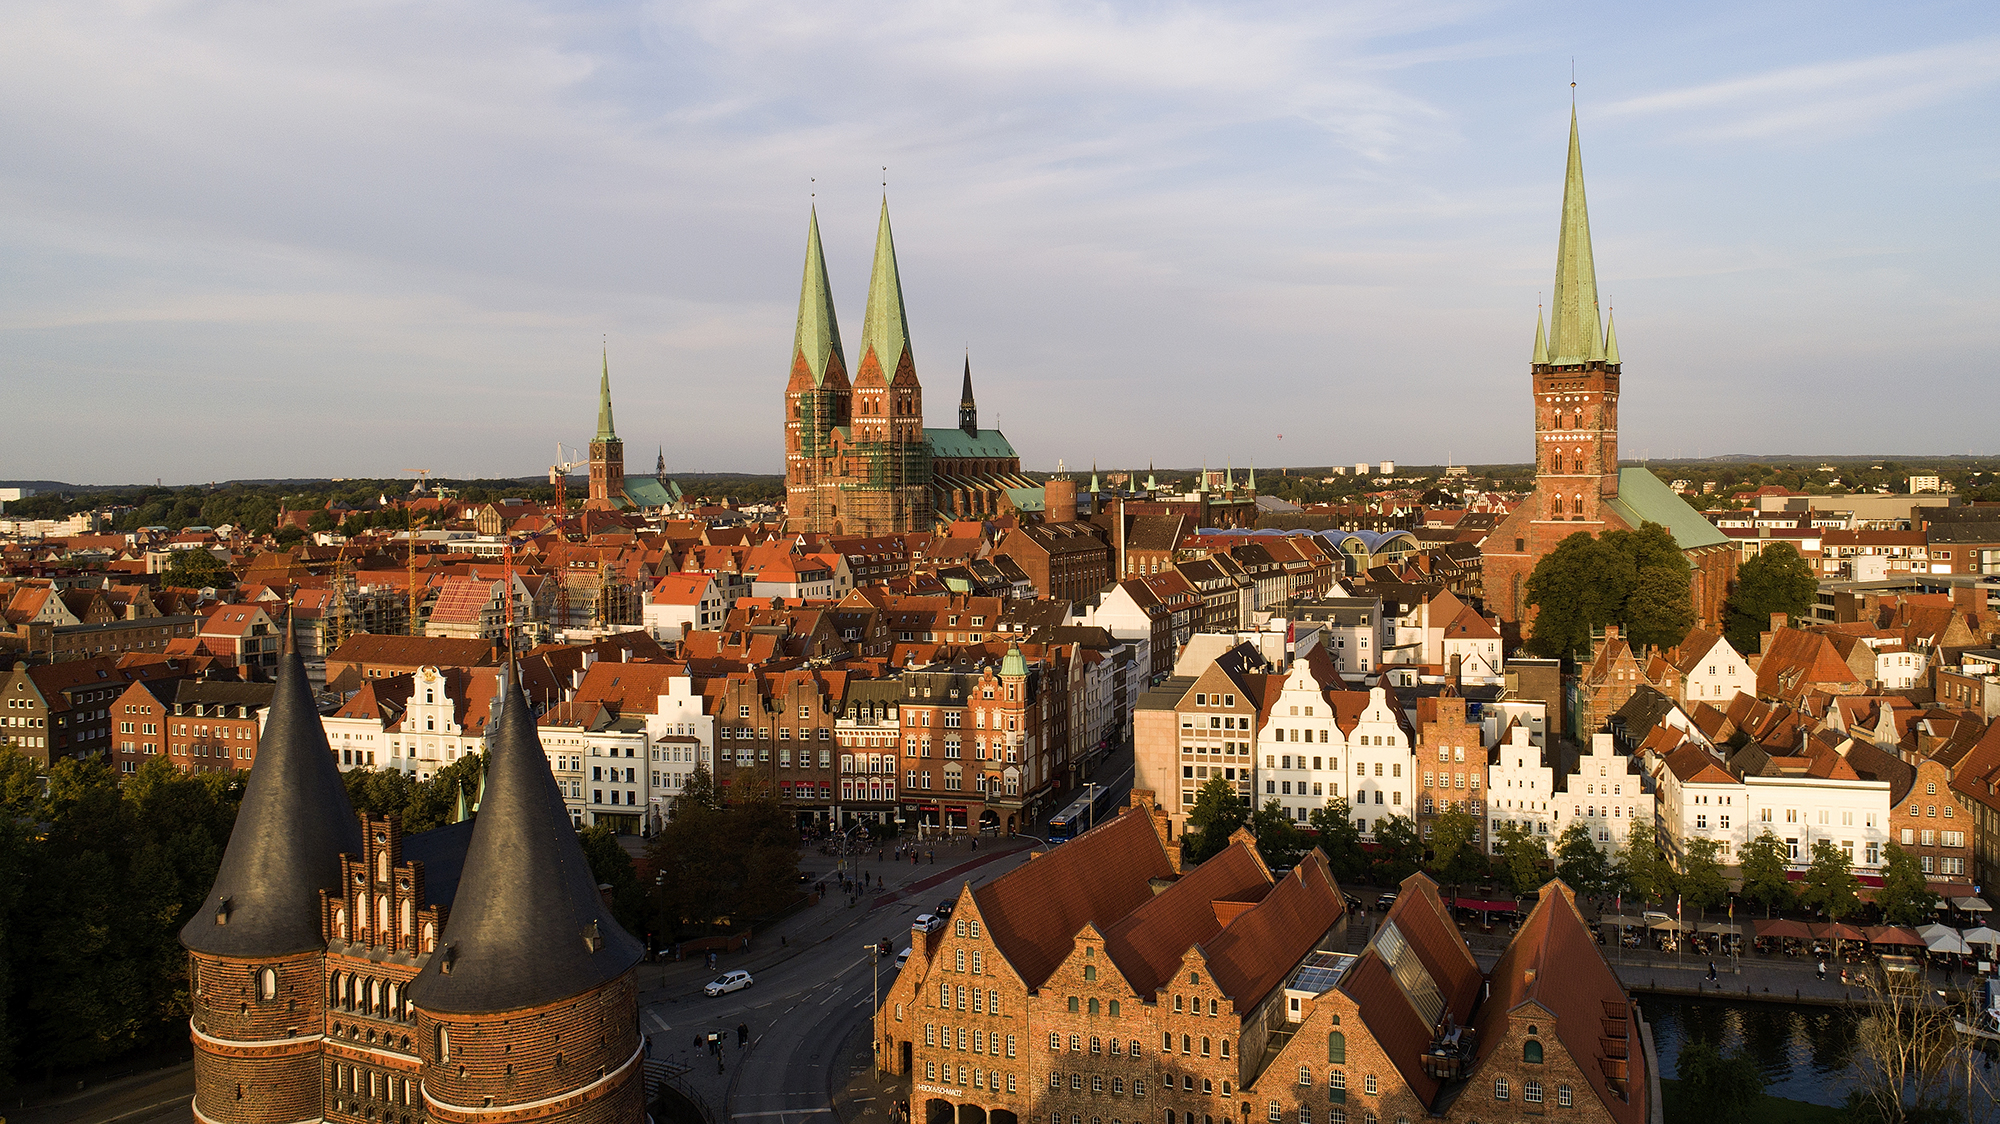 Lübeck-Tourismusfotografie